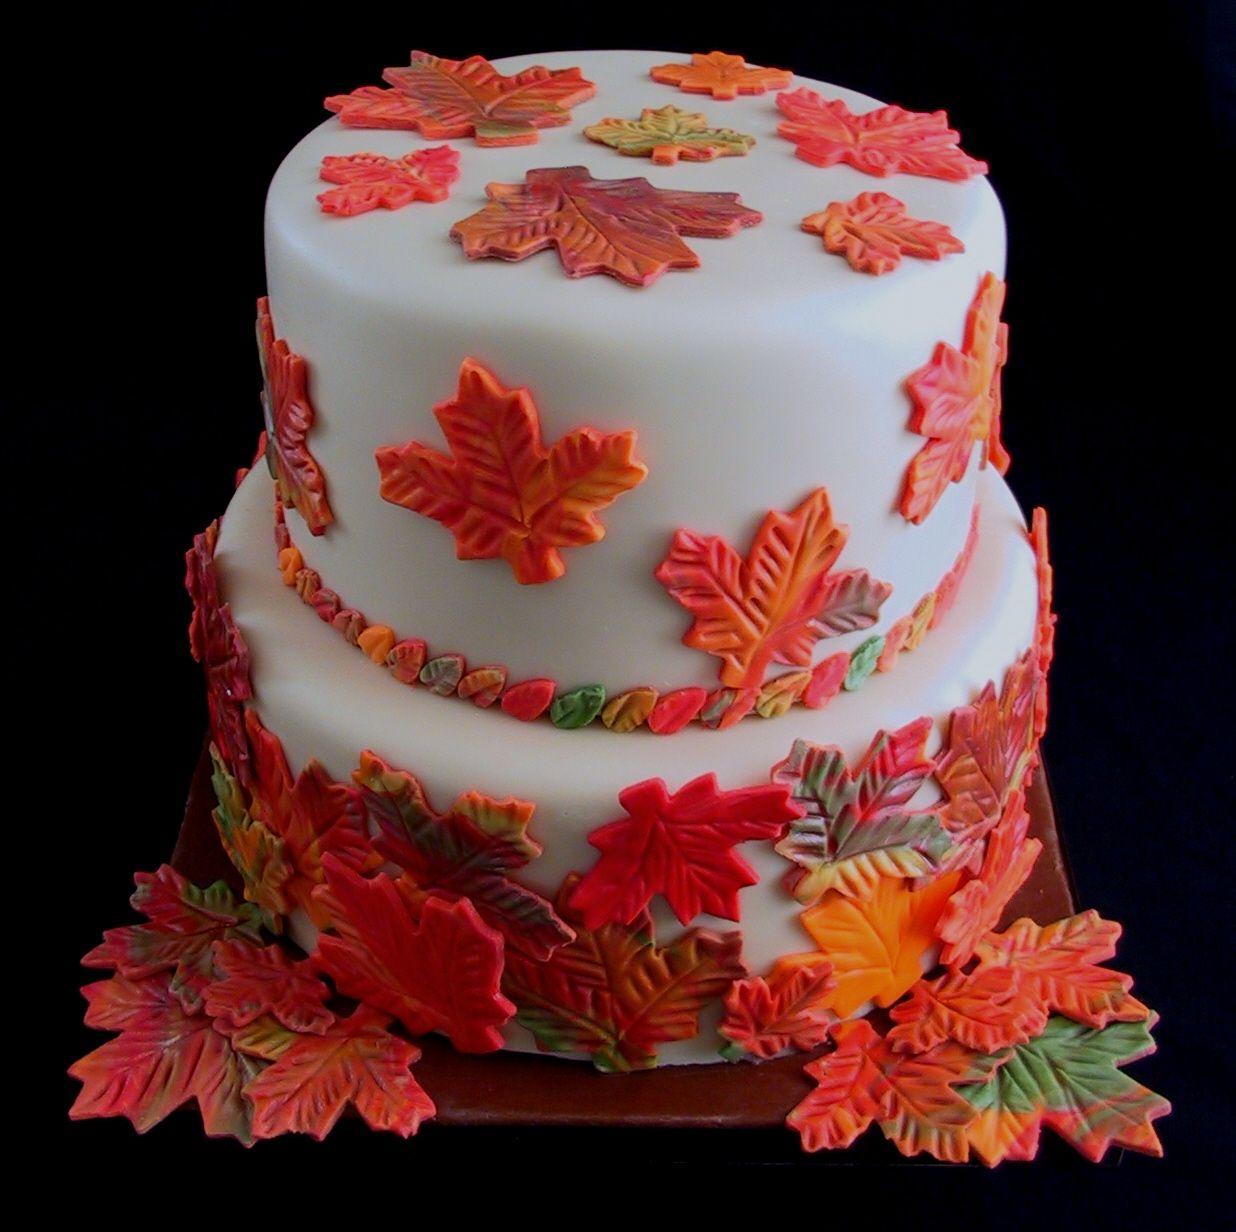 Cake ideas on pinterest pirate cakes marshmallow fondant and - Wedding Cake Beautiful Inspiring Fall Themed Wedding Cake Designs Minimalist Tiered Ivory Marshmallow Fondant Wedding Cake Design In Lovely Fall Color